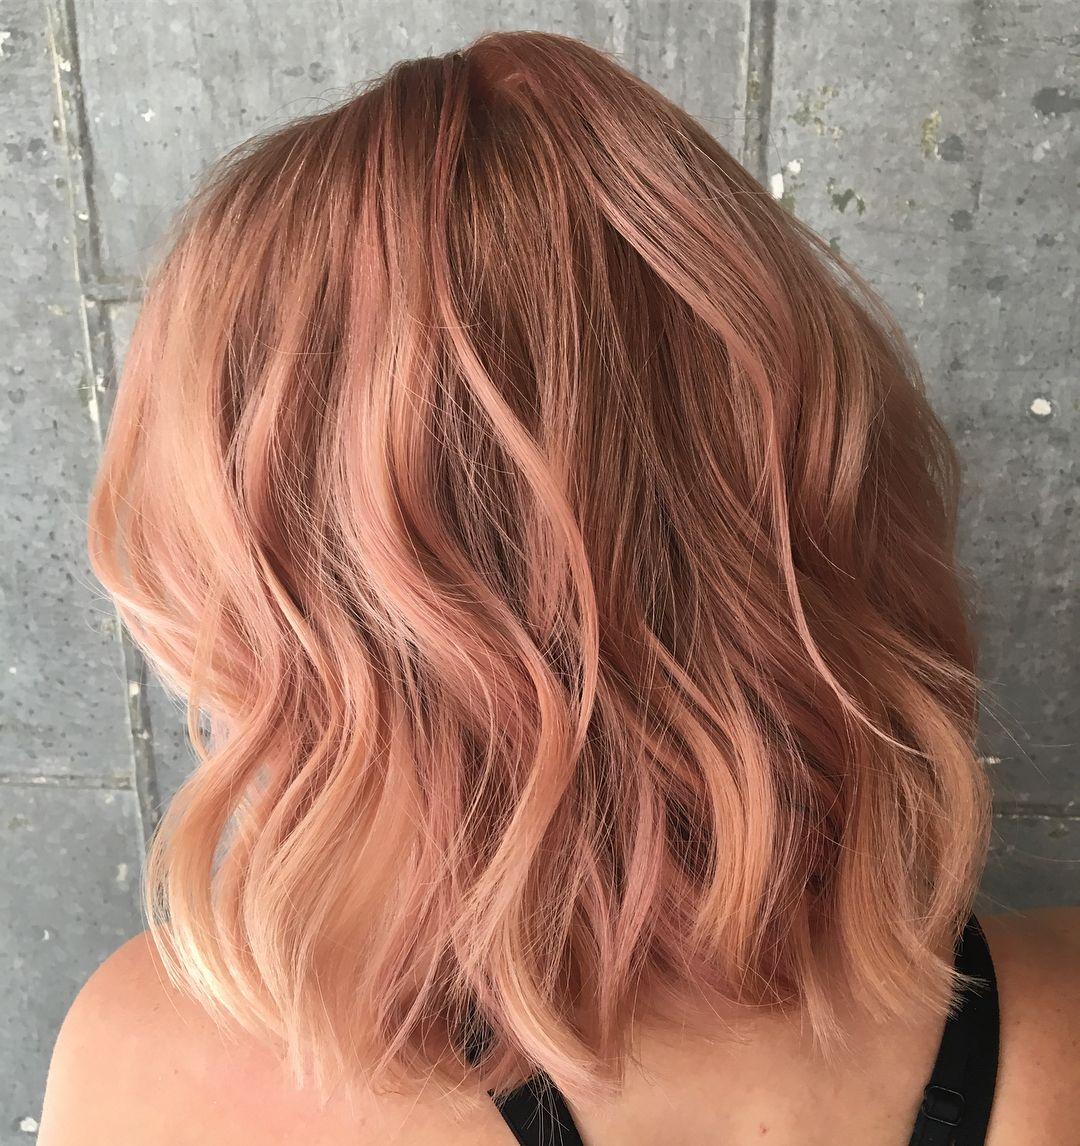 Strawberry Blonde Ginger Hair With Highlights Viral And Trend In 2020 Blonde Hair With Highlights Red Blonde Hair Hair